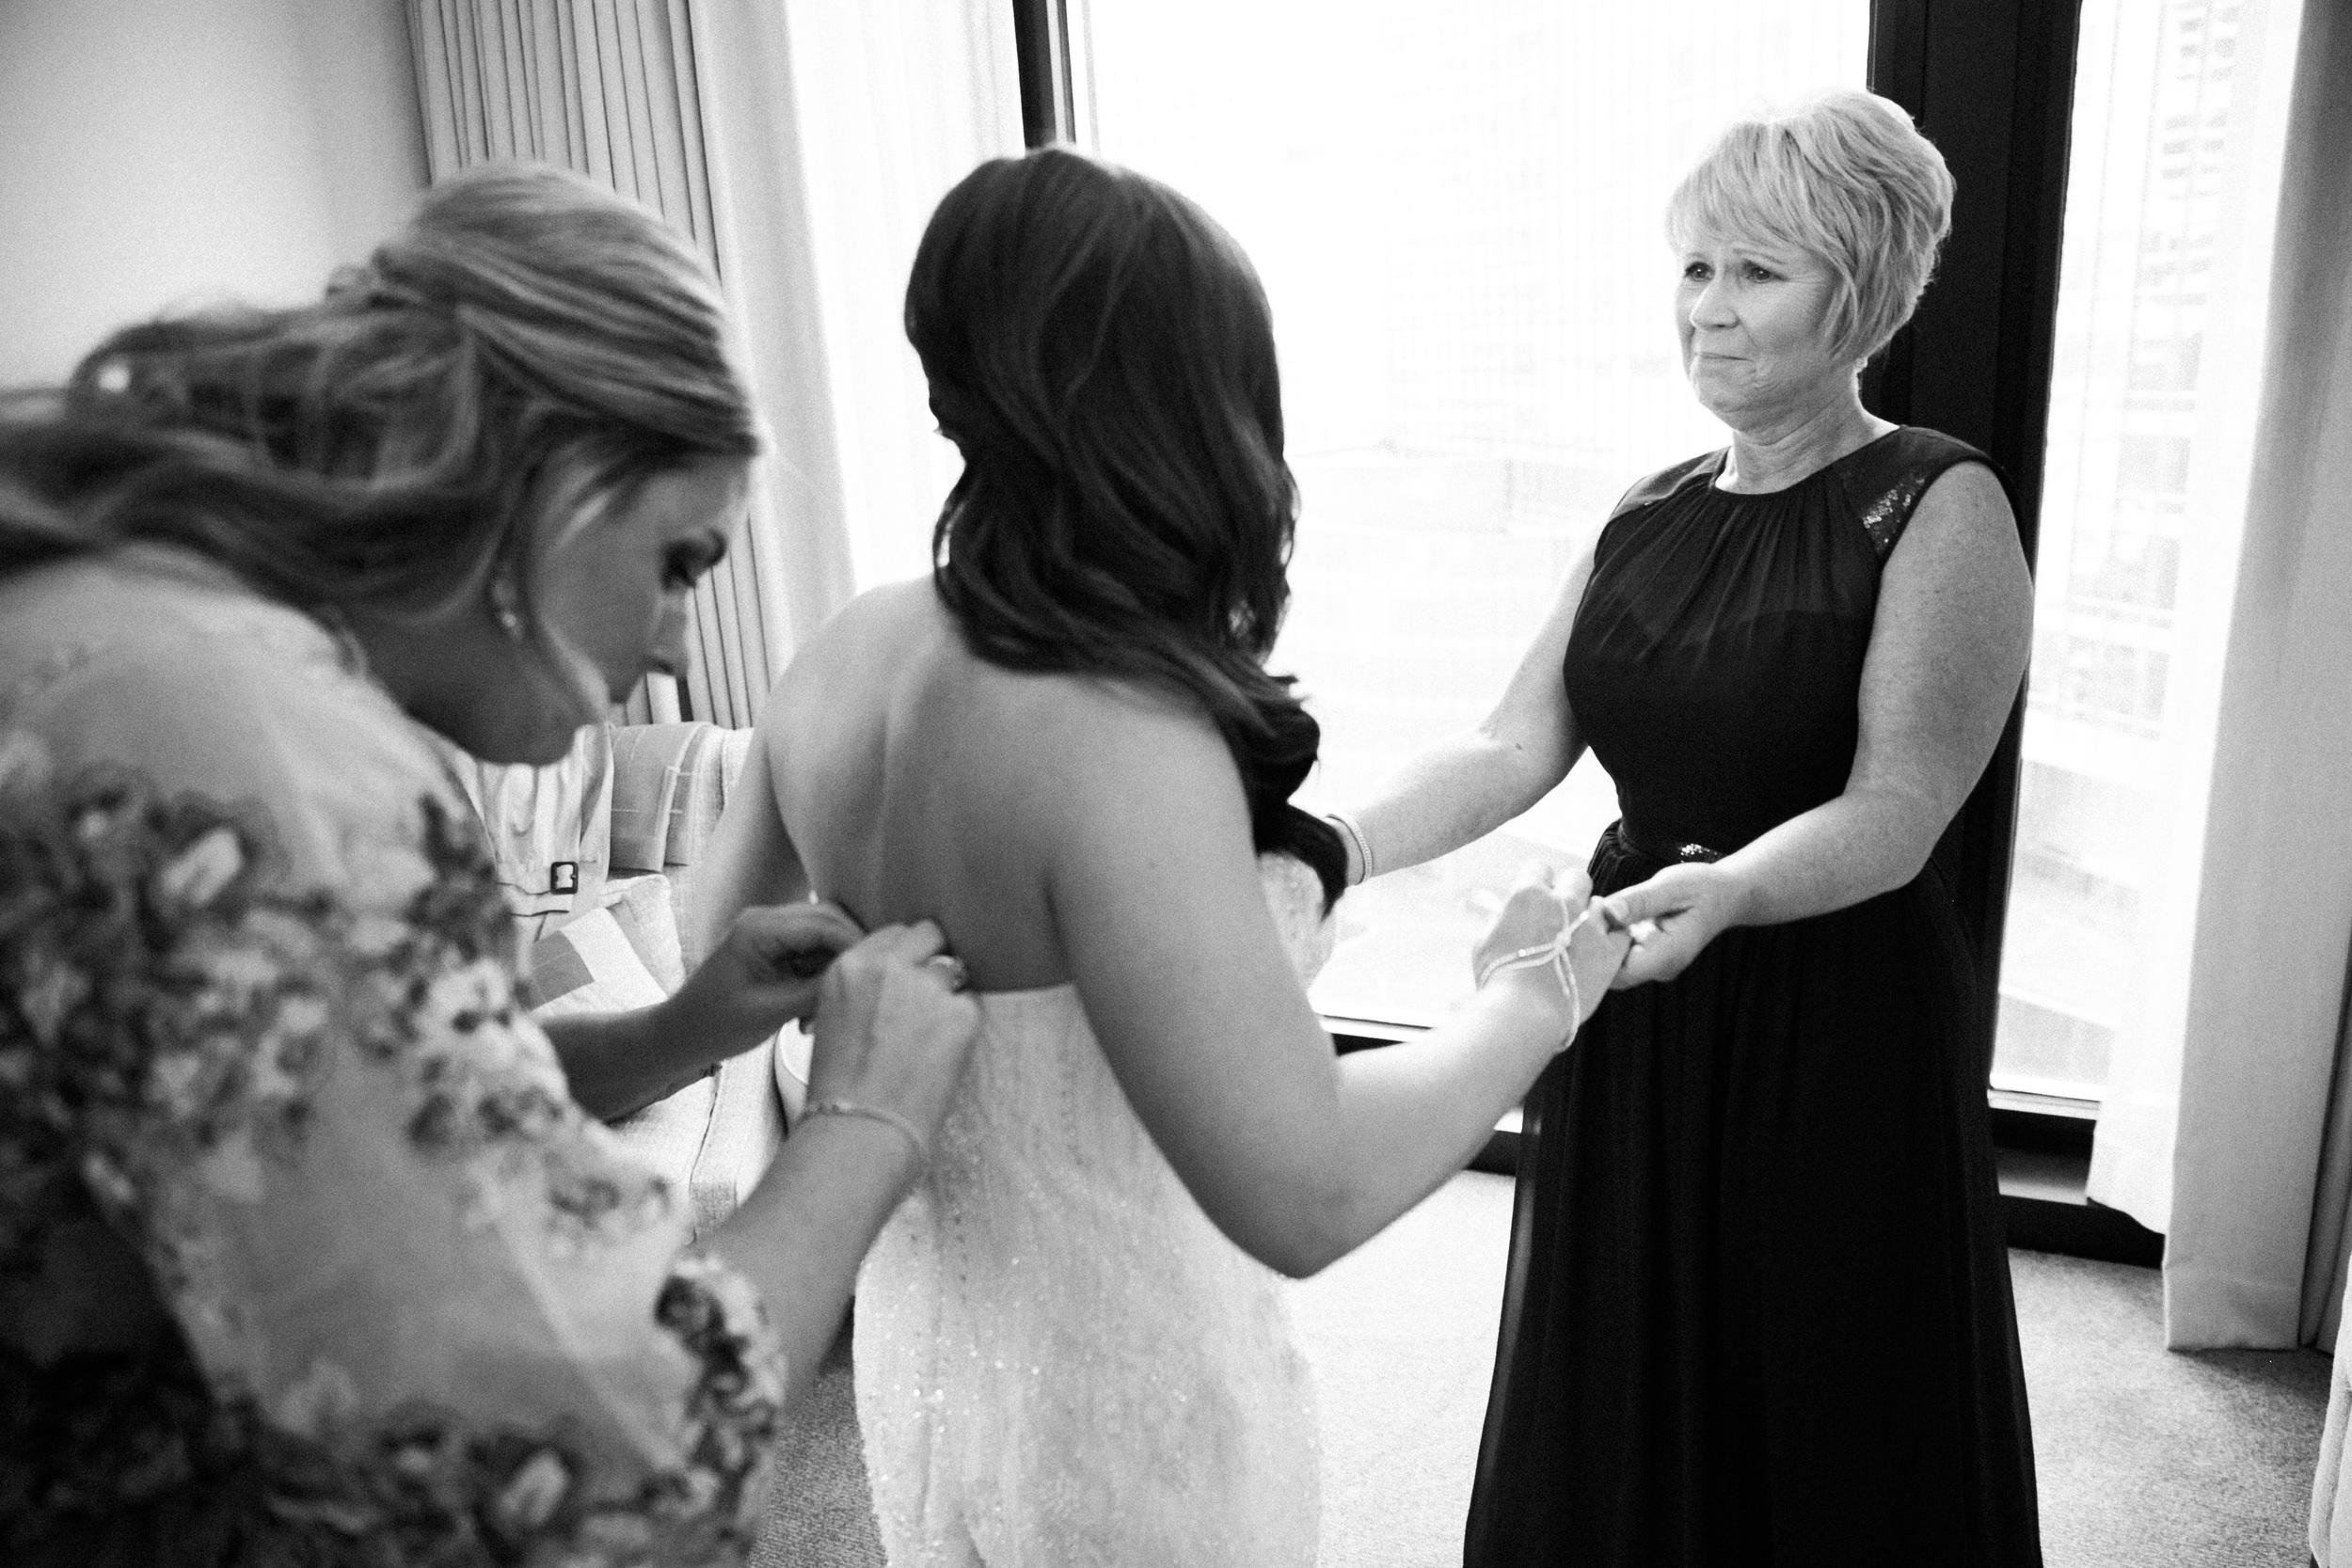 mayden_photography_weddings-22.jpg